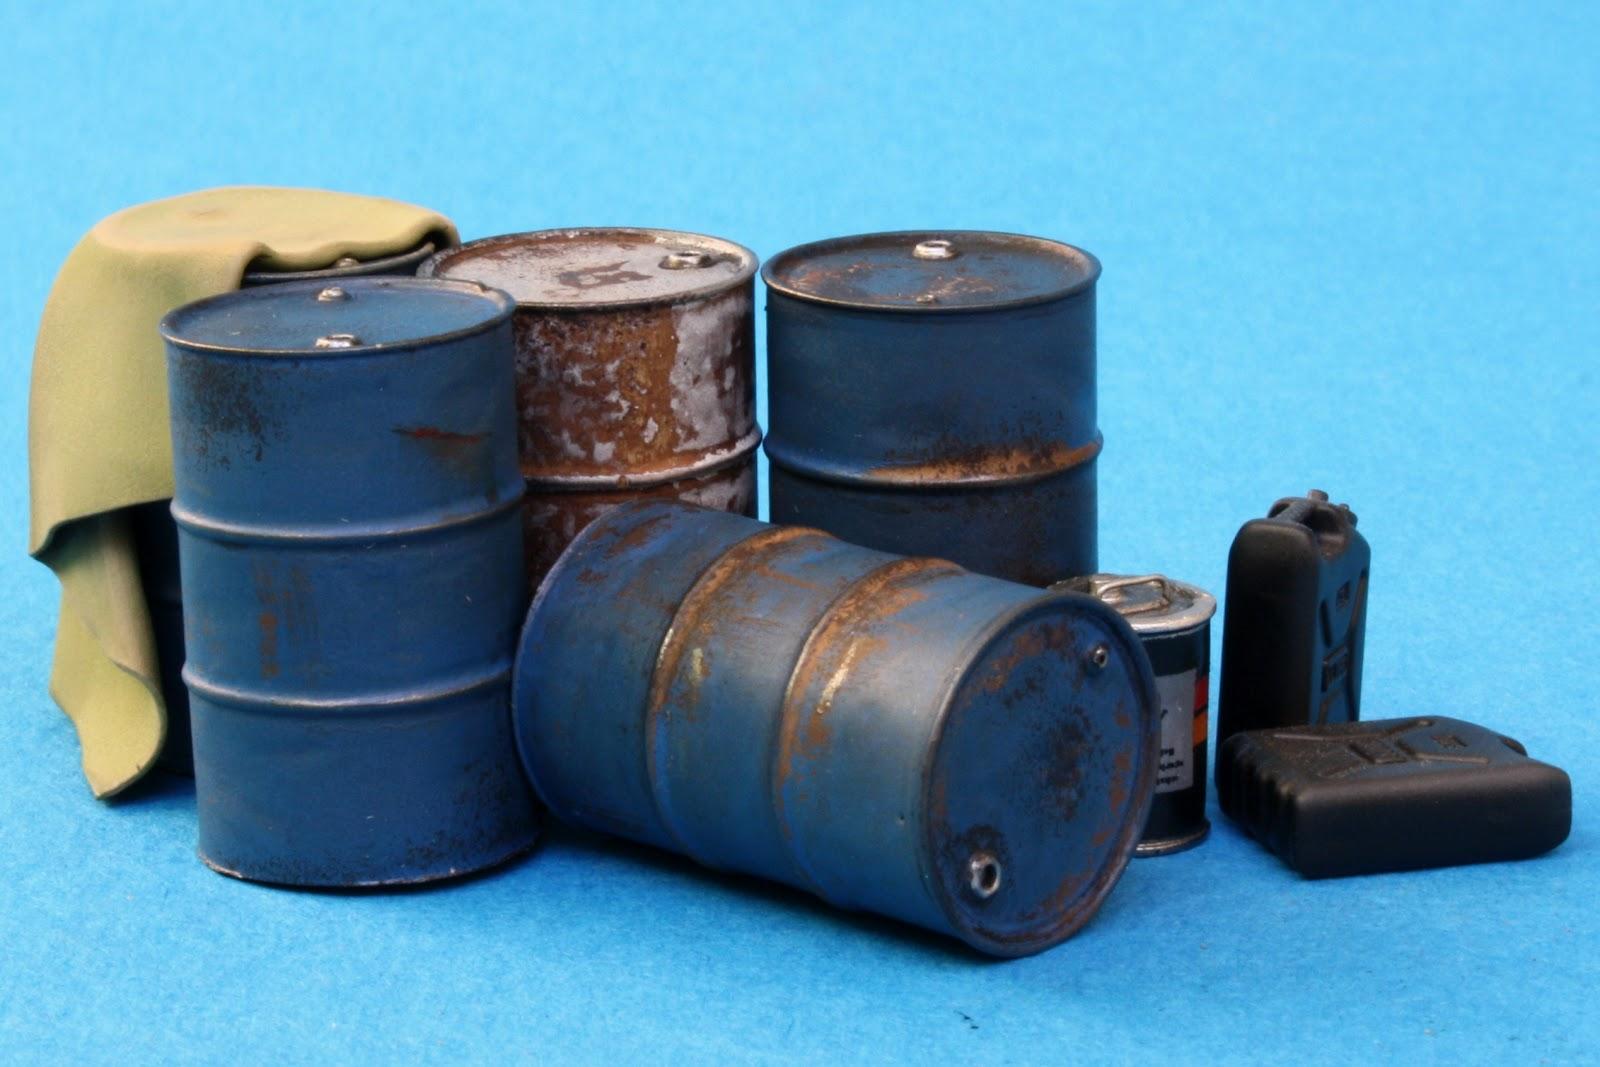 Miniature Creations 1 35 Guntruck Factory Iraq Fuel Drums